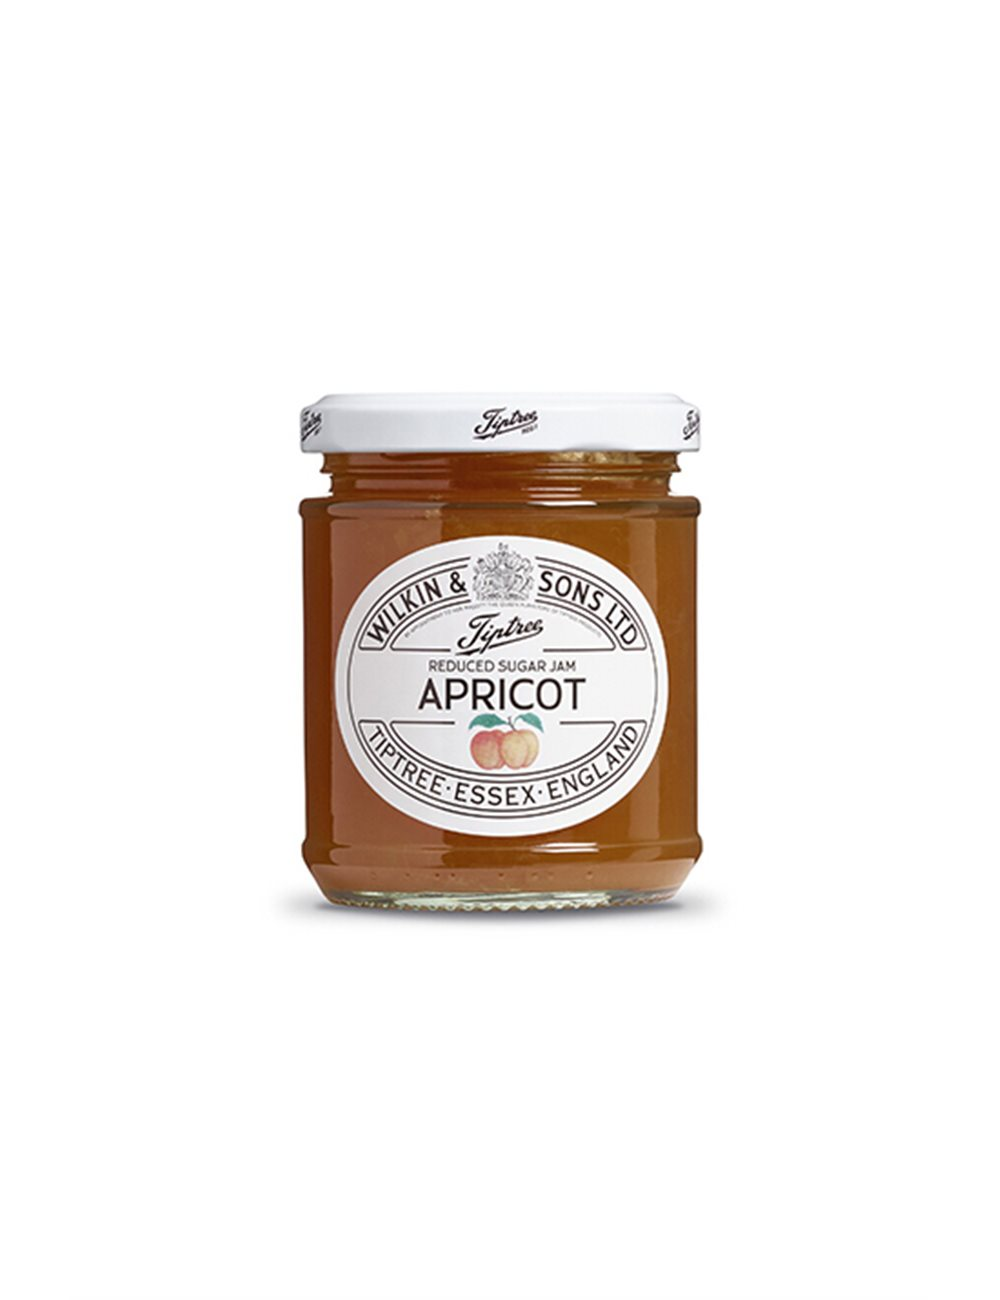 Reduced Sugar Preserve Apricot Marmalade 71% 200g